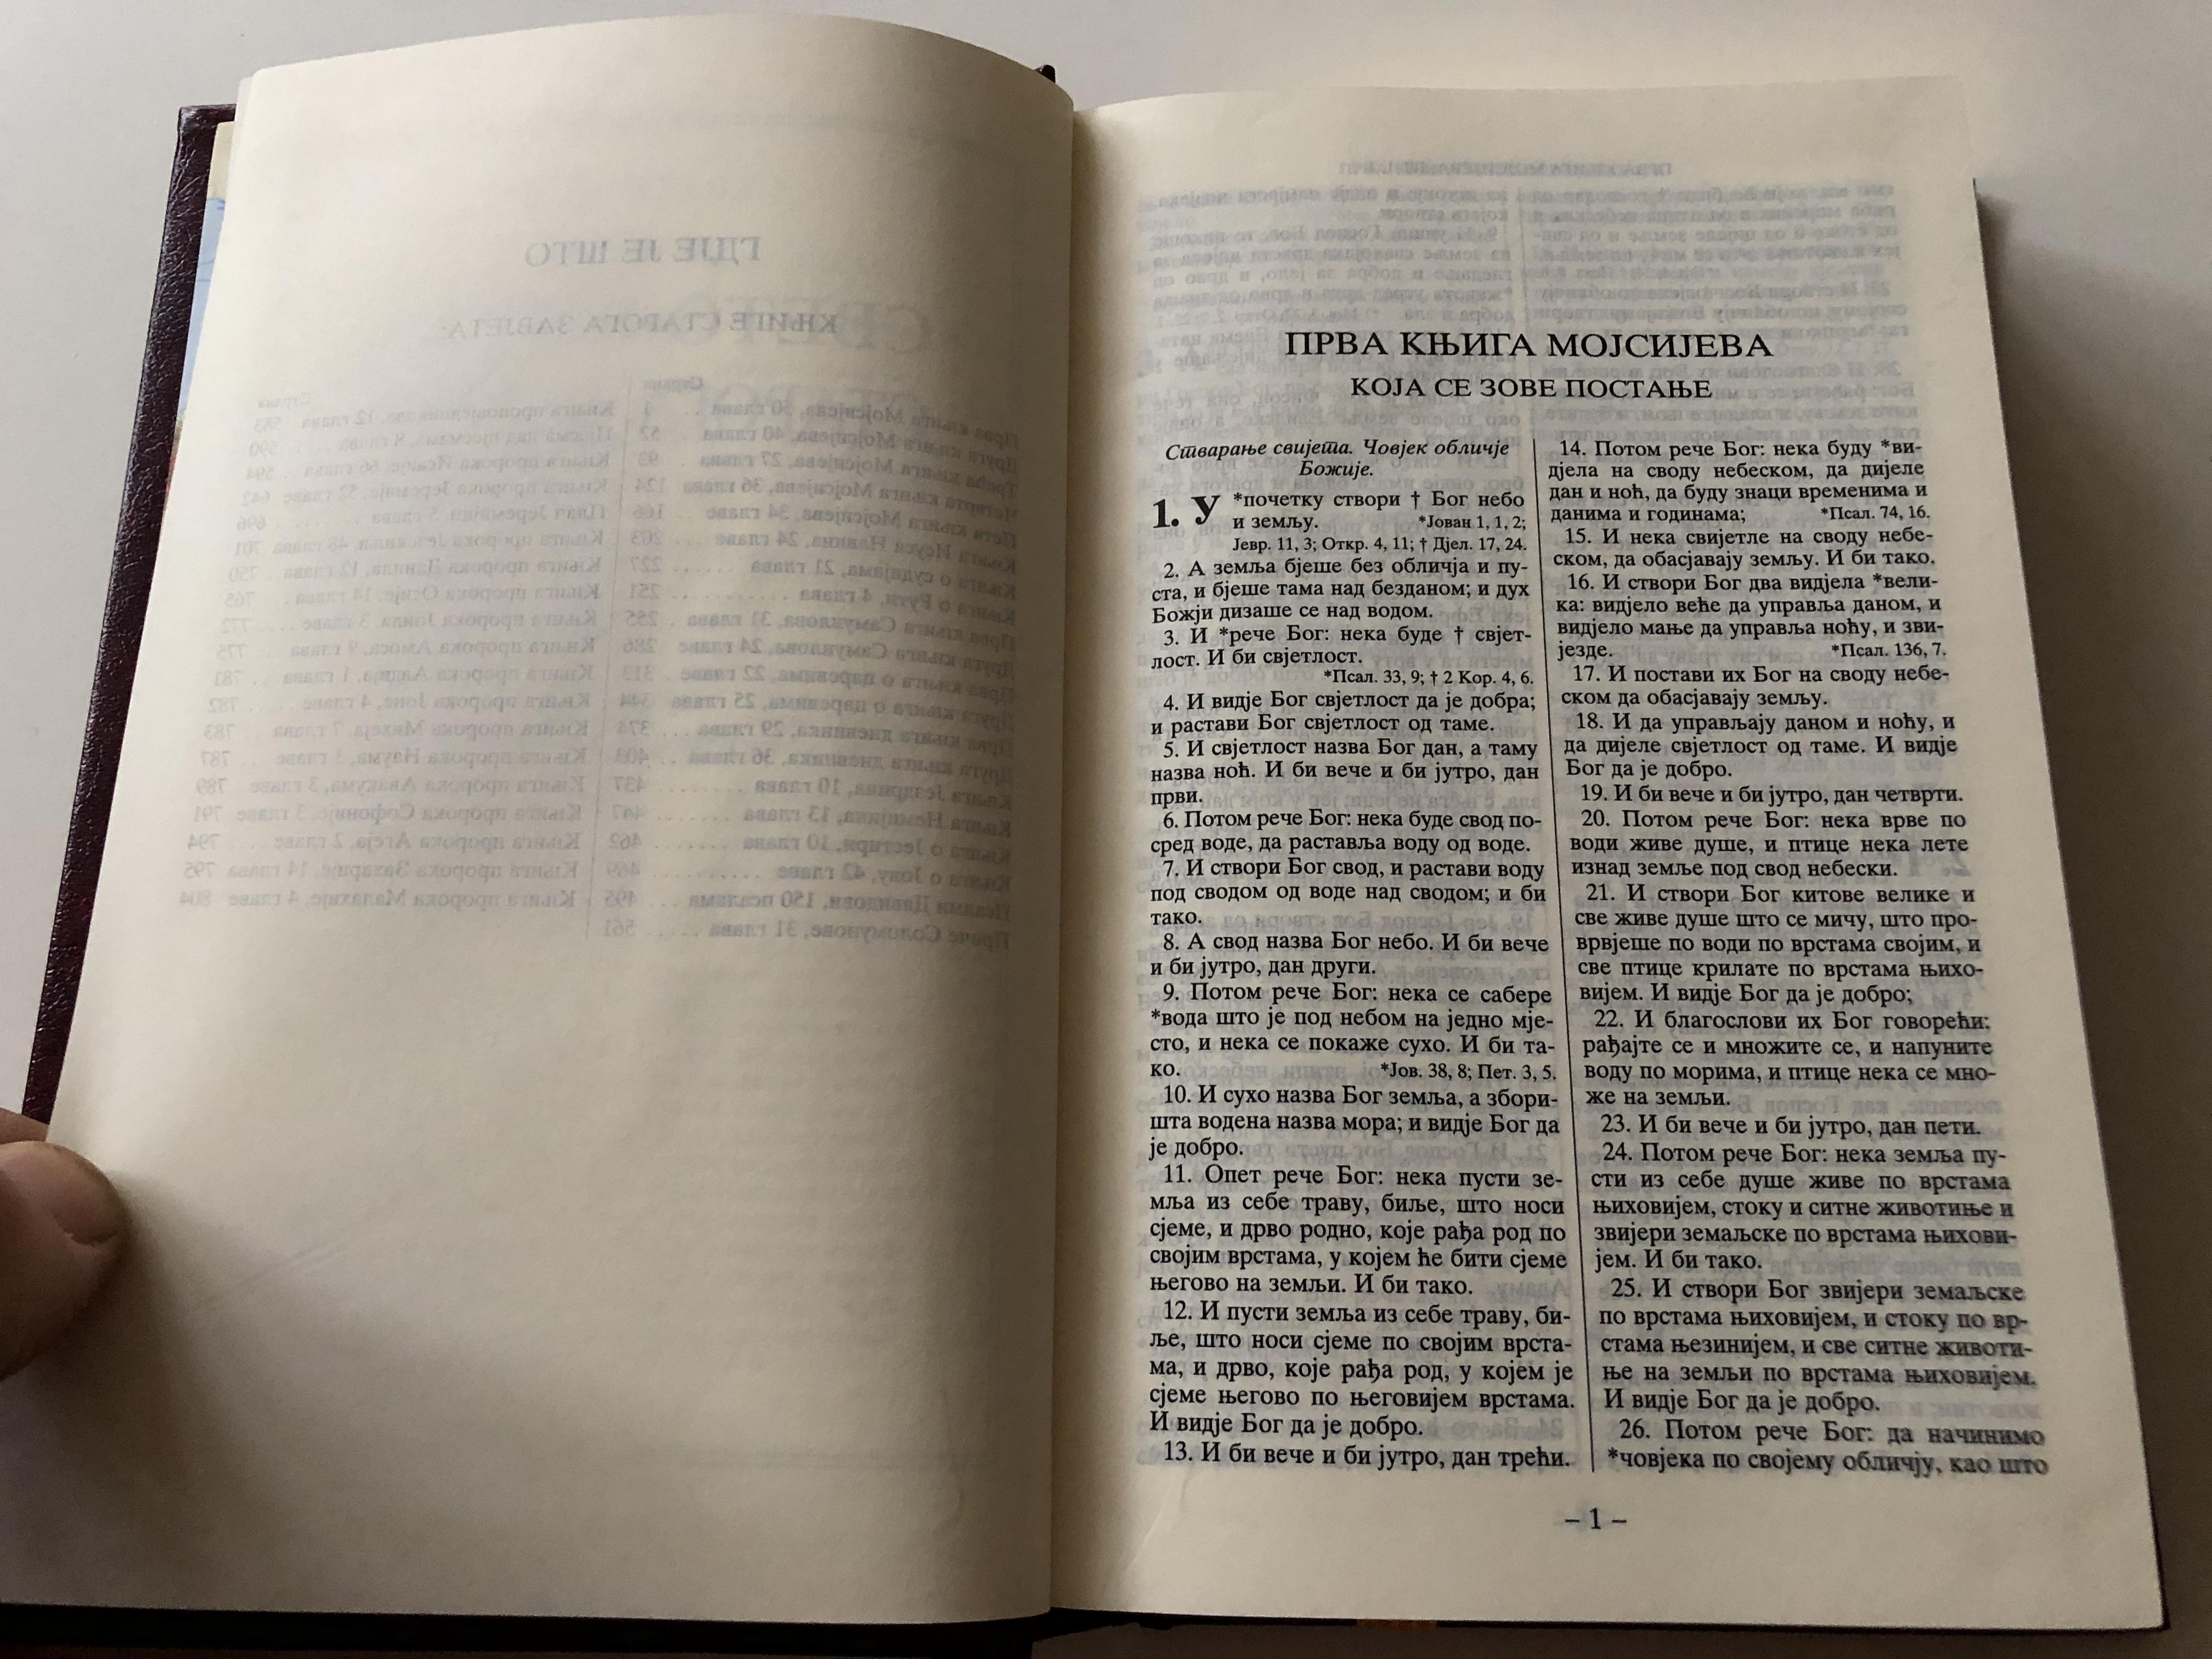 serbian-language-bible-burgundy-cover-with-golden-cross-cyrillic-script-043hs-12-.jpg